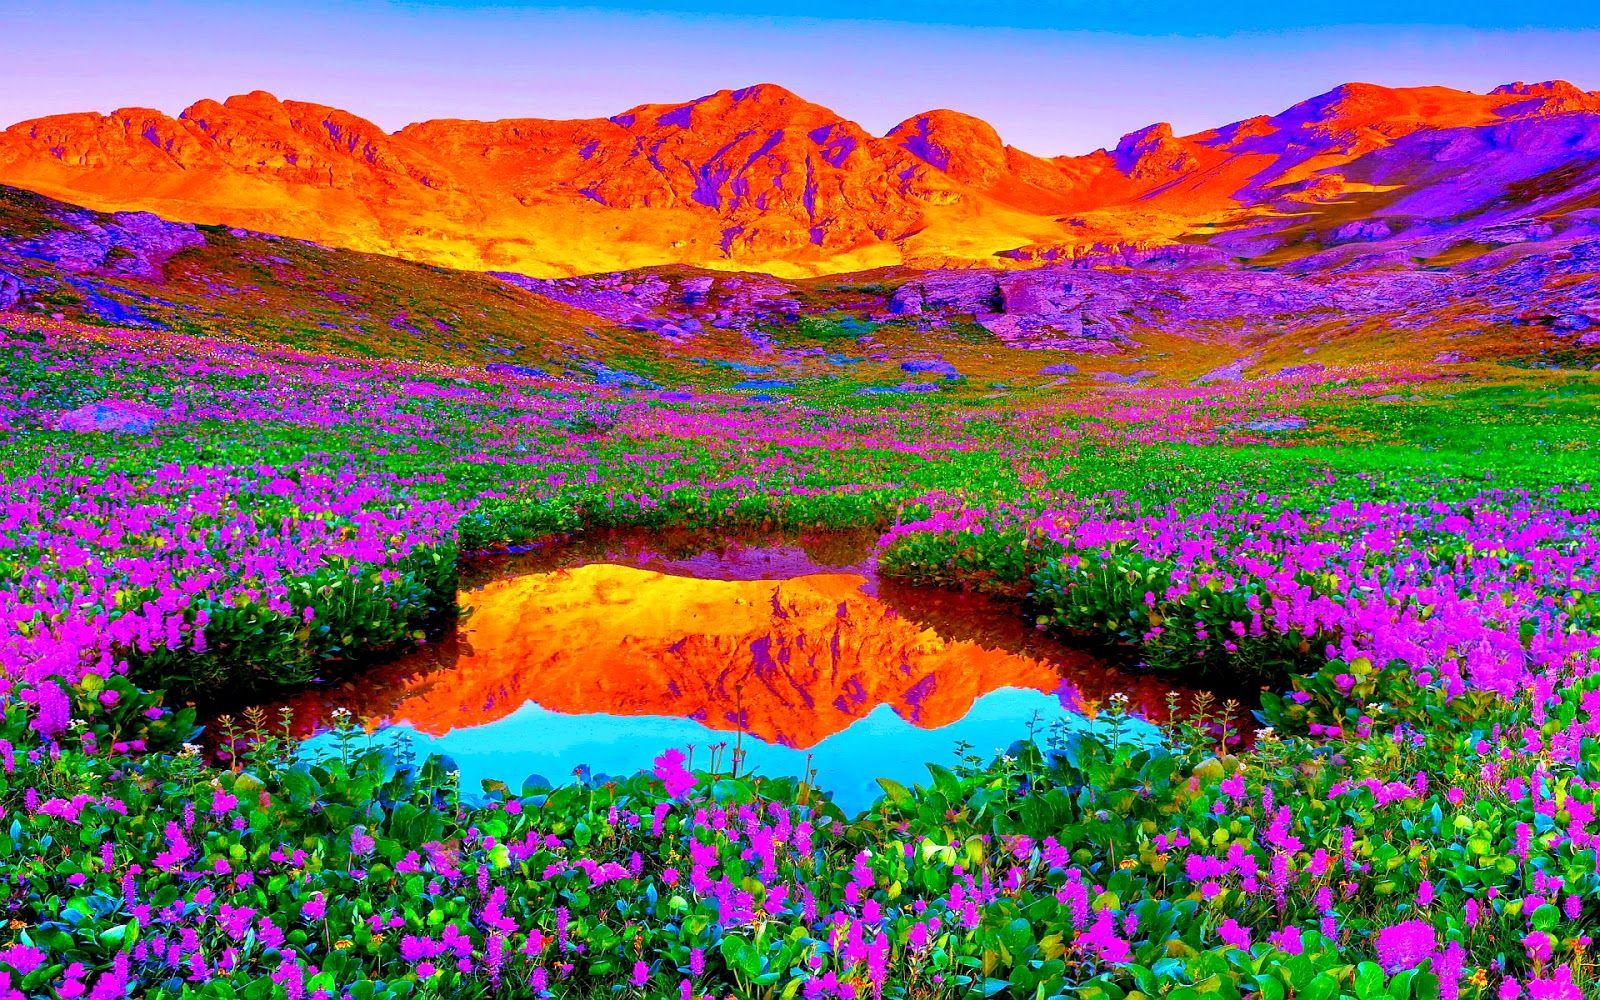 اجمل صور الطبيعة هدف نت Beautiful Nature Pictures Colorful Mountains Beautiful Nature